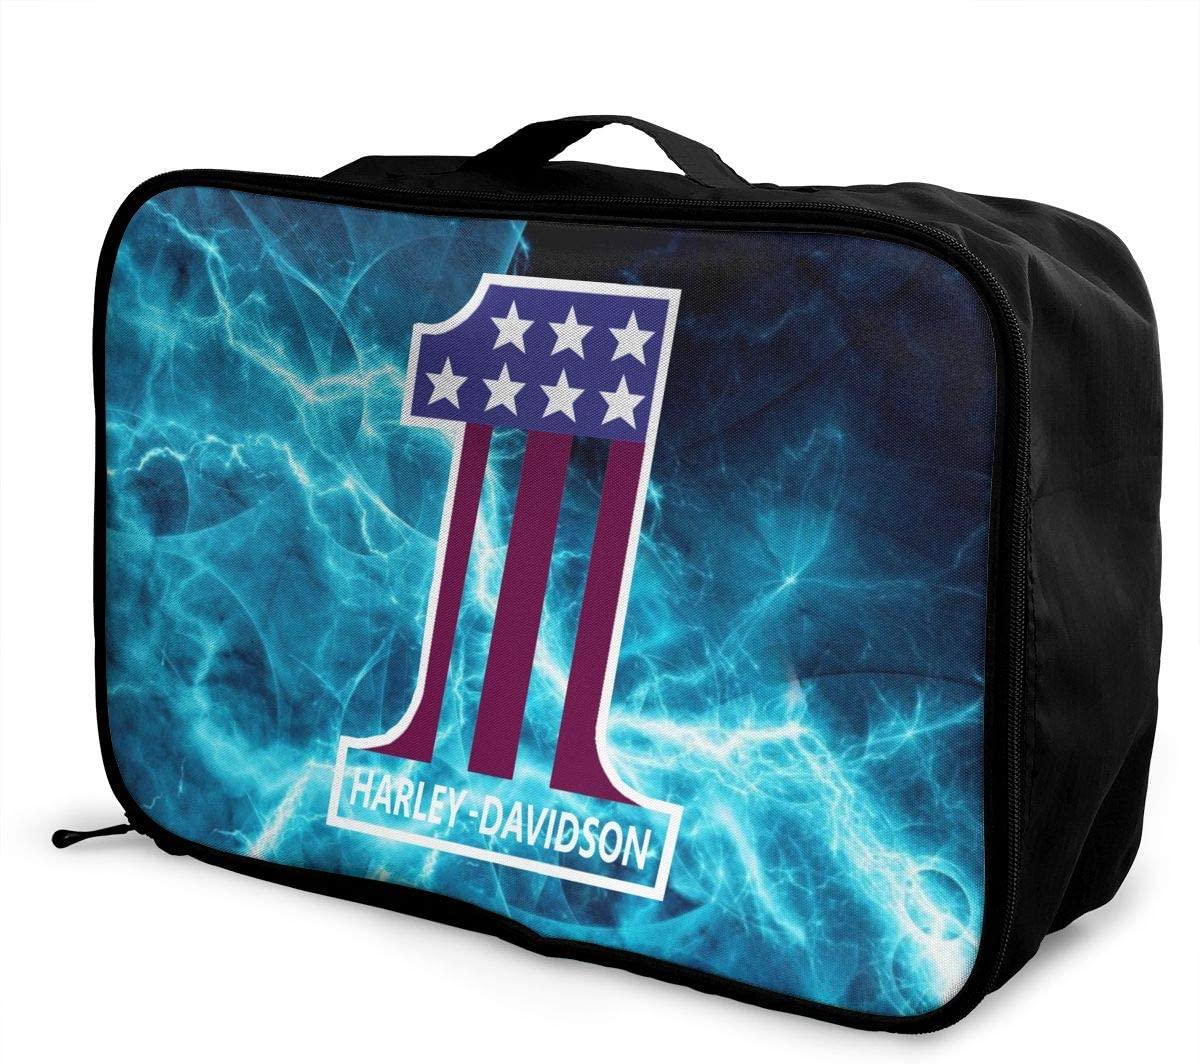 Travel Luggage Bag Harley Davidson Lightweight Super Large Capacity Hand Luggage Bag Weekend Bag Overnight Carry Bag